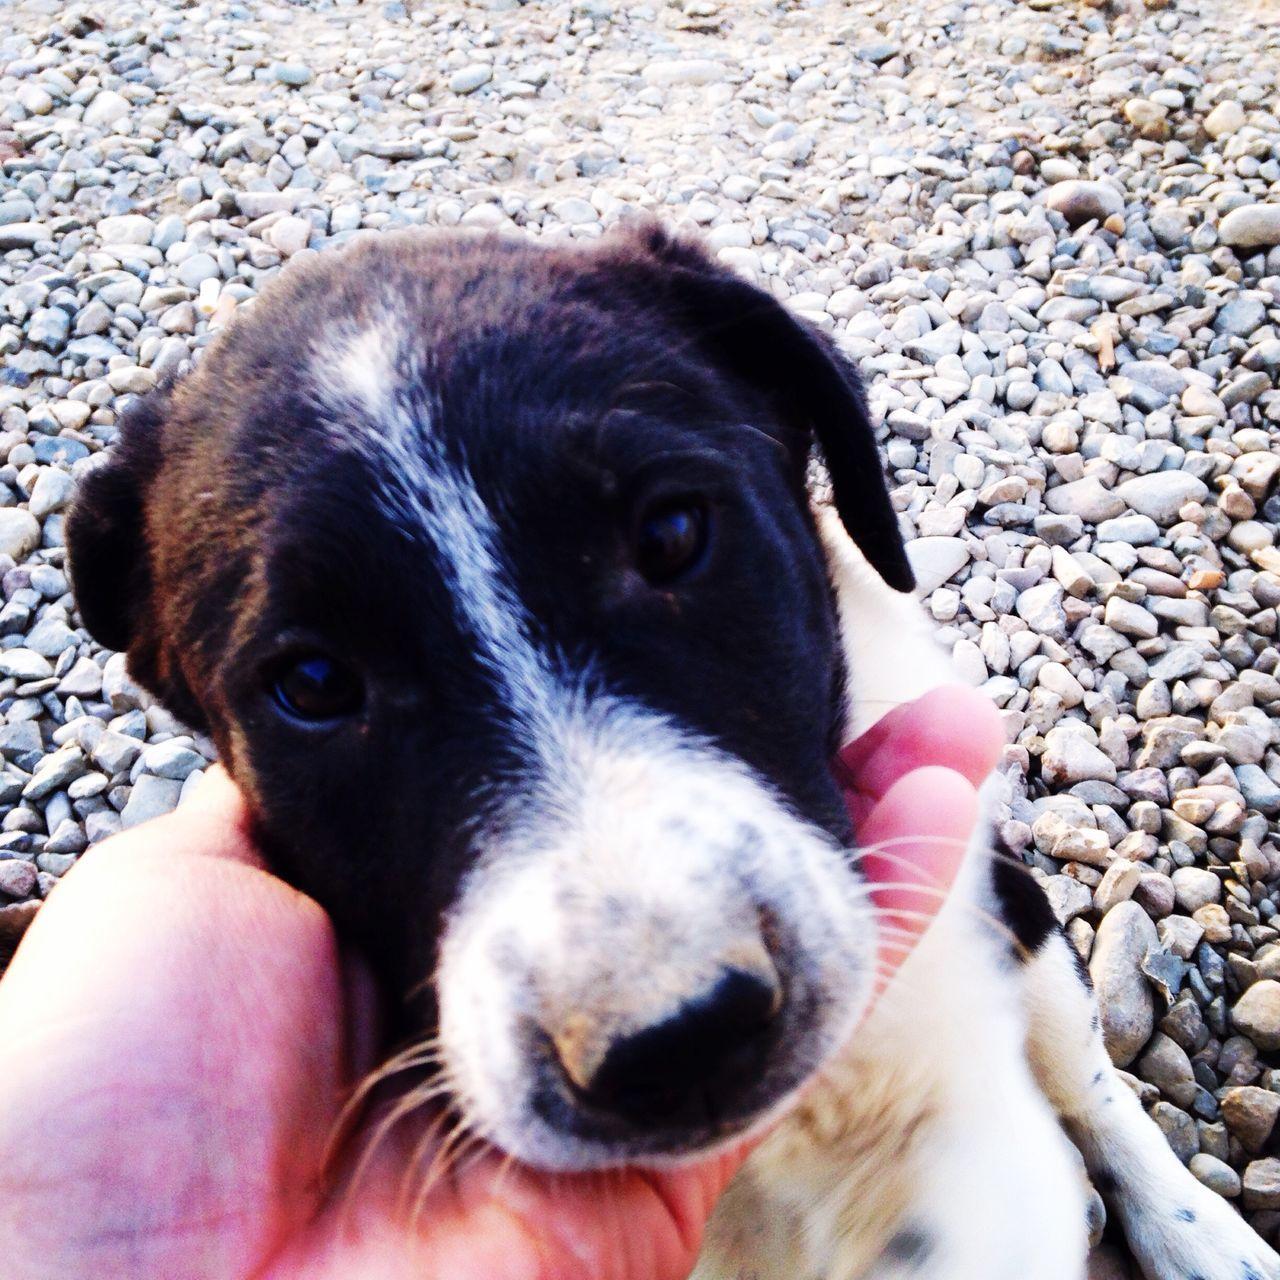 For The Love Of Pets Pet Photography  Cute Pets Petslife Pets Daily Petsofeyeem My Pets :)